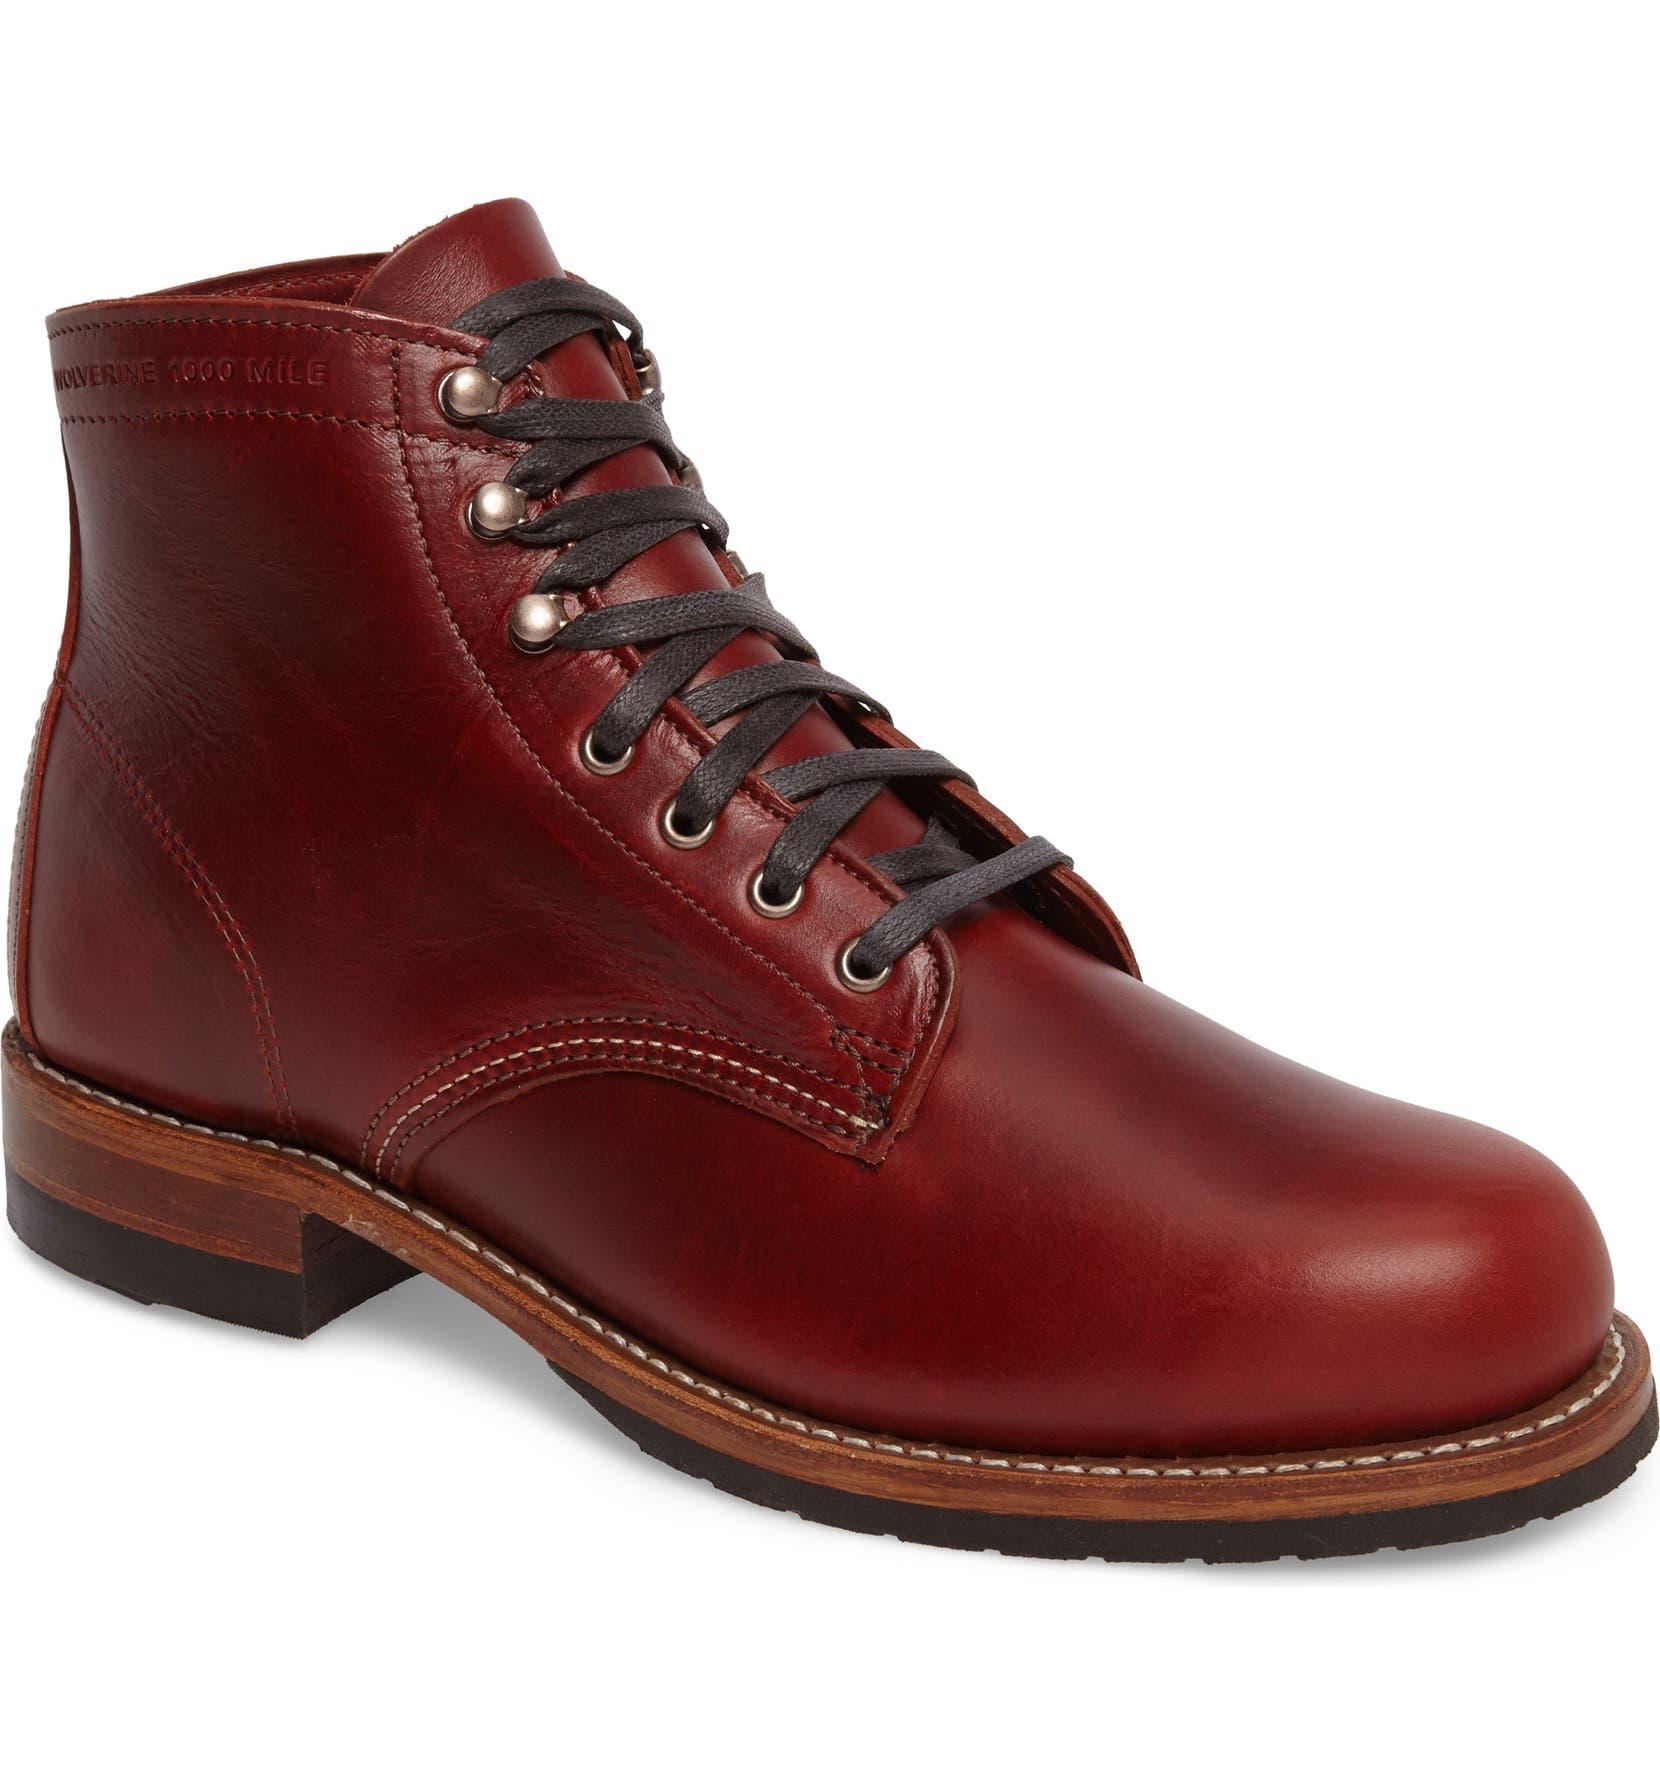 78d4f81d3a8 Evans Plain Toe Boot